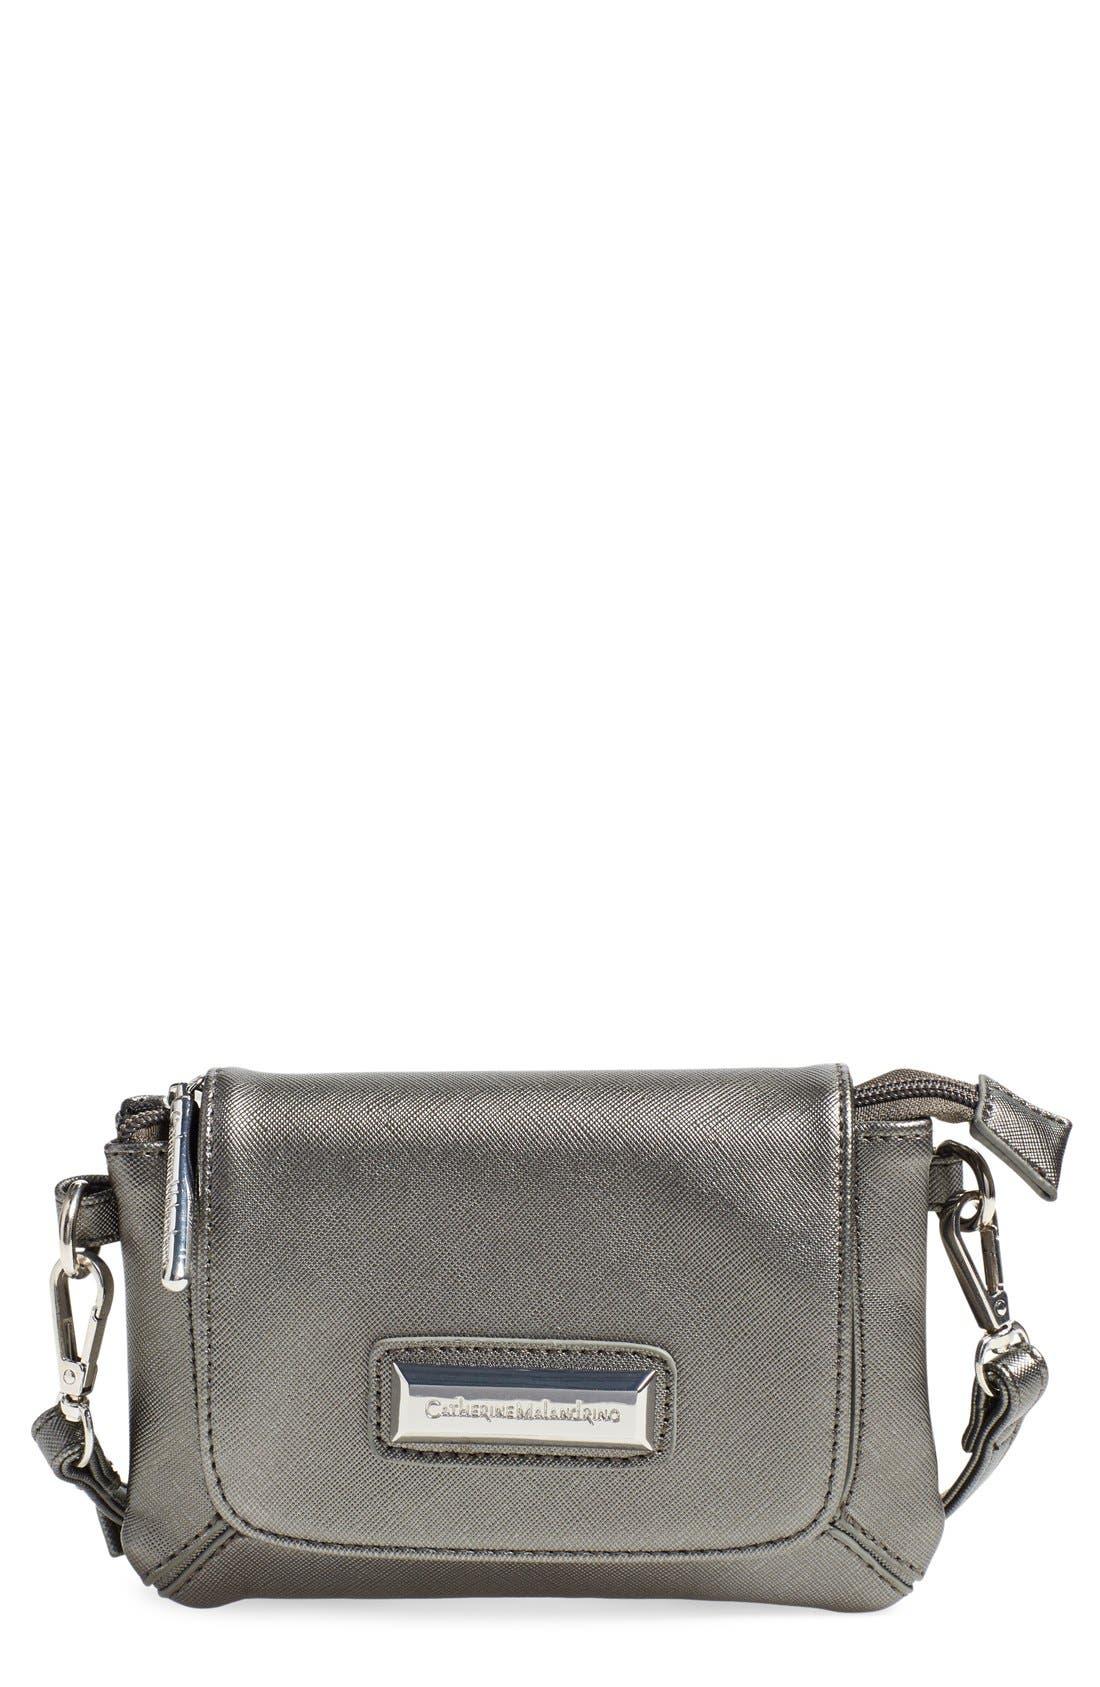 Alternate Image 1 Selected - Catherine Catherine Malandrino 'Mini Clara' Crossbody Bag